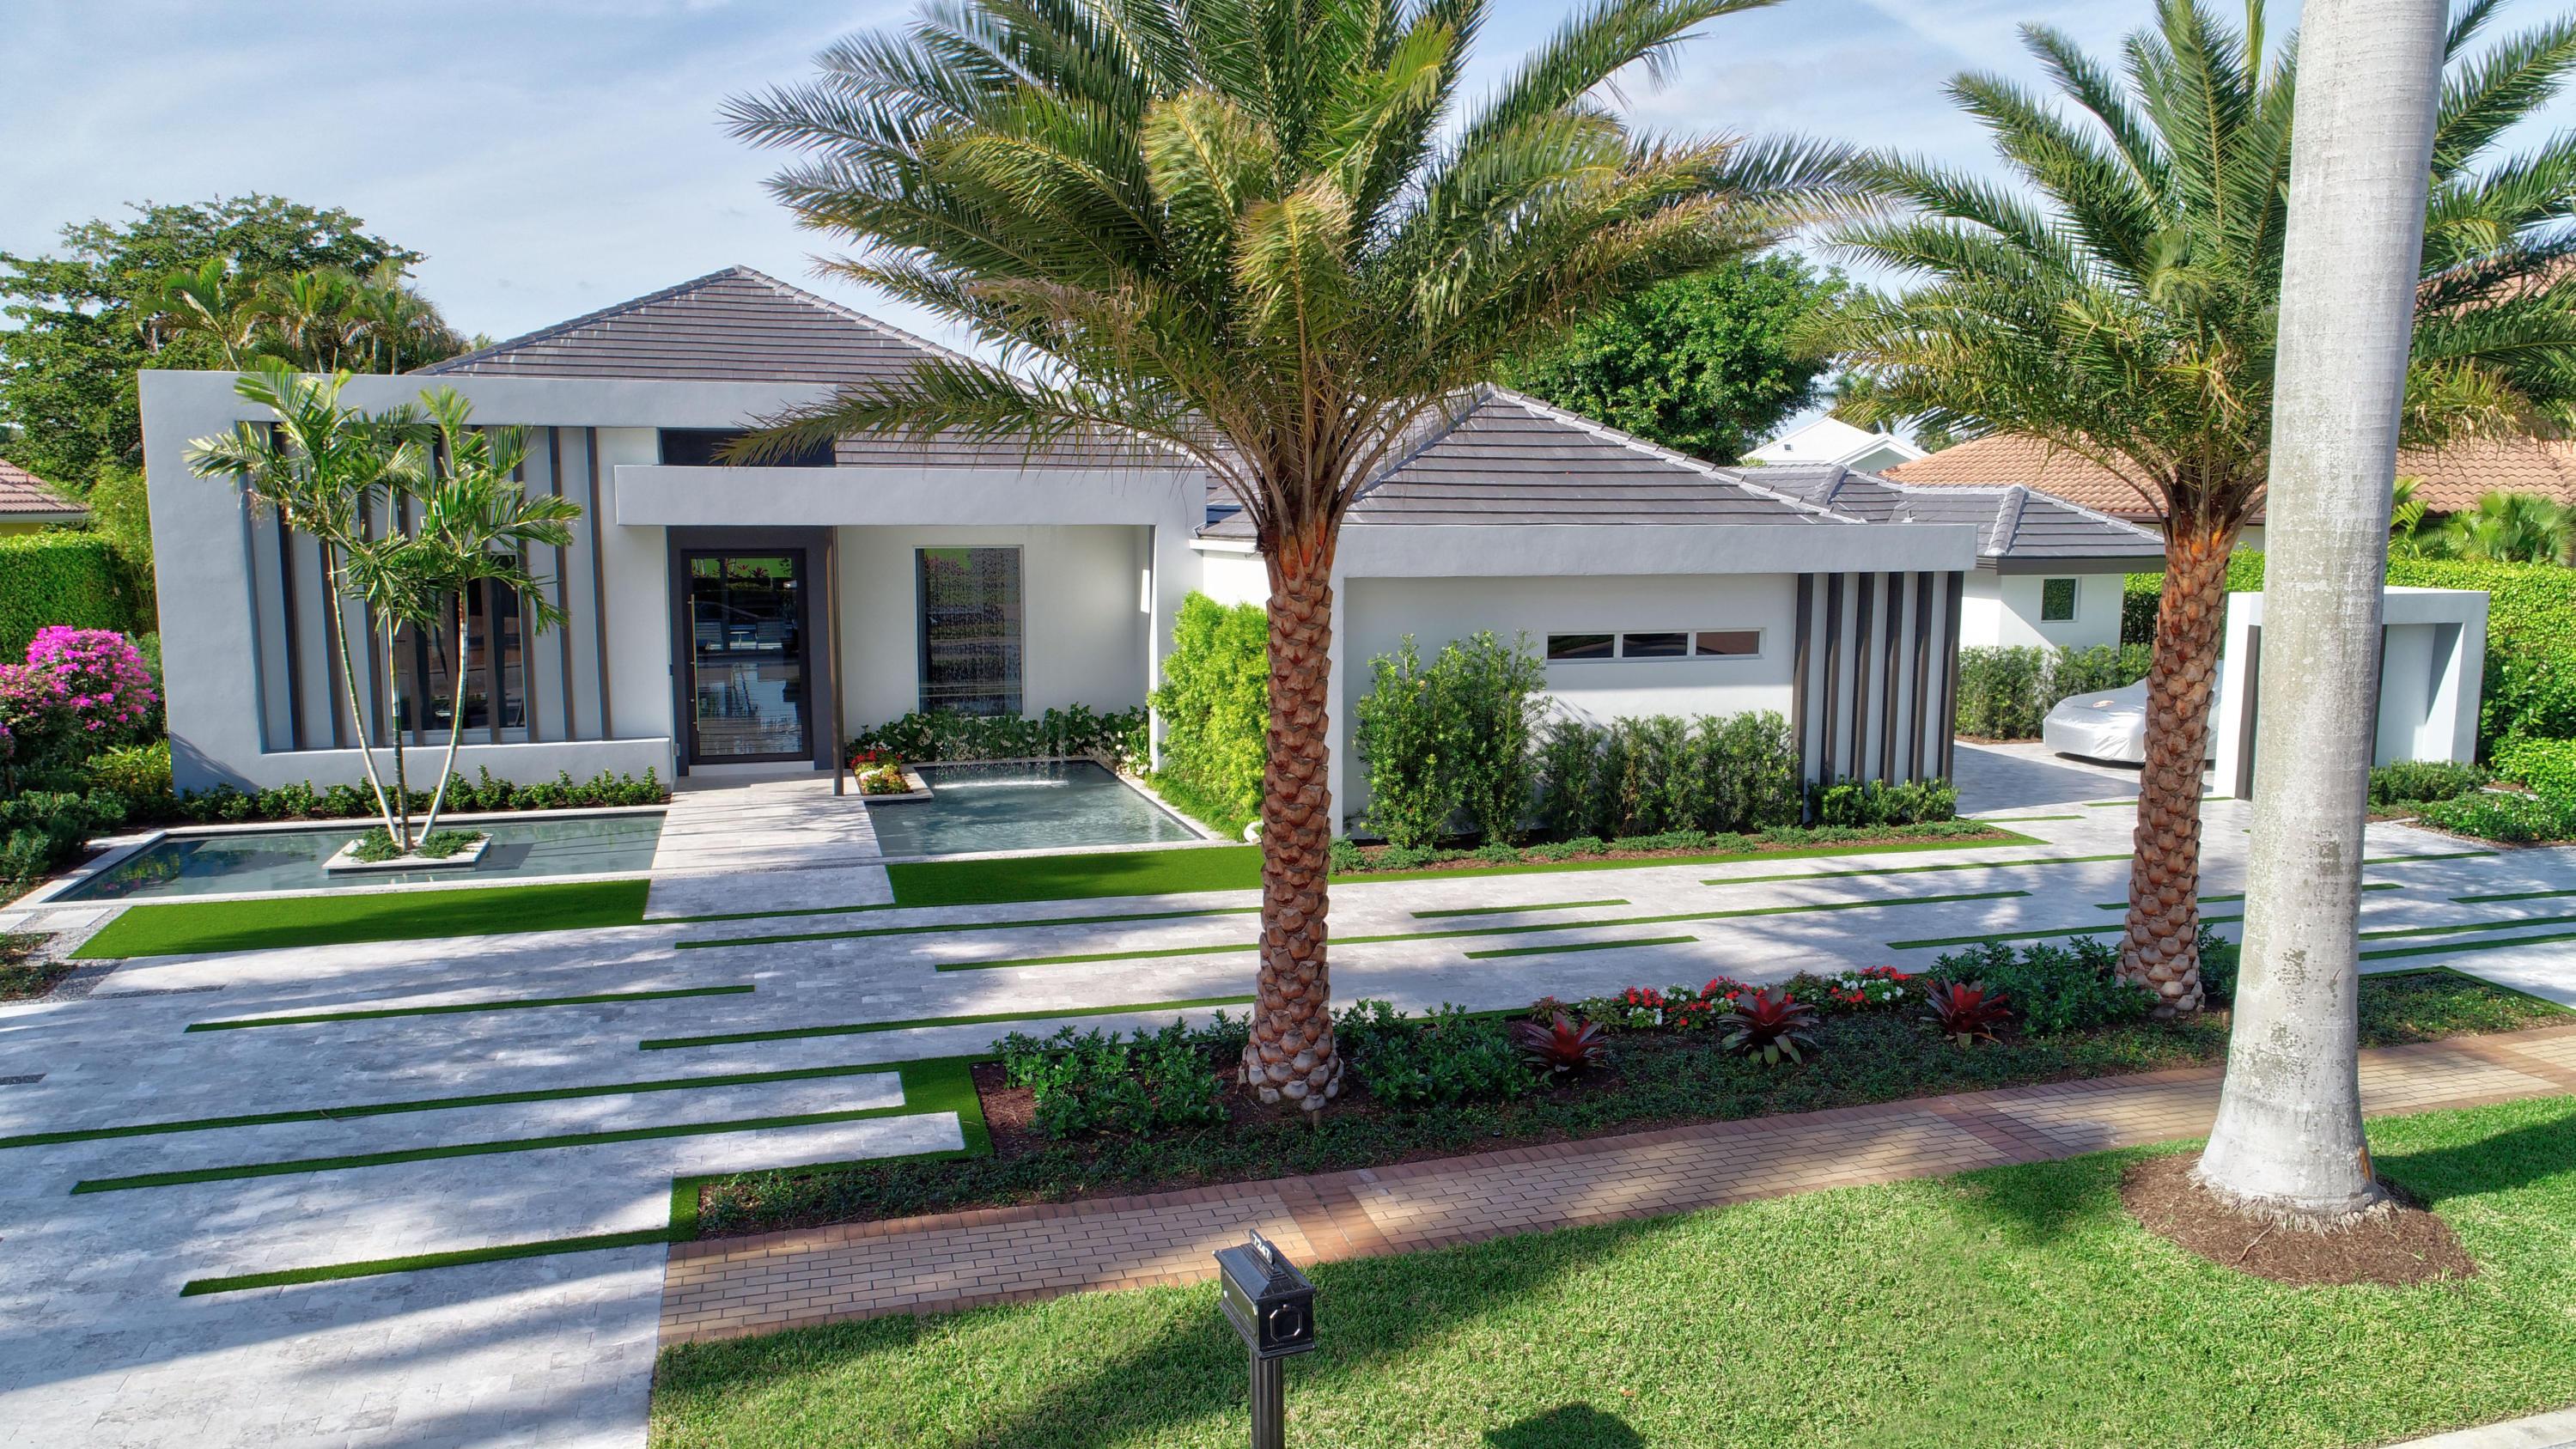 7247 Ballantrae Court  Boca Raton FL 33496